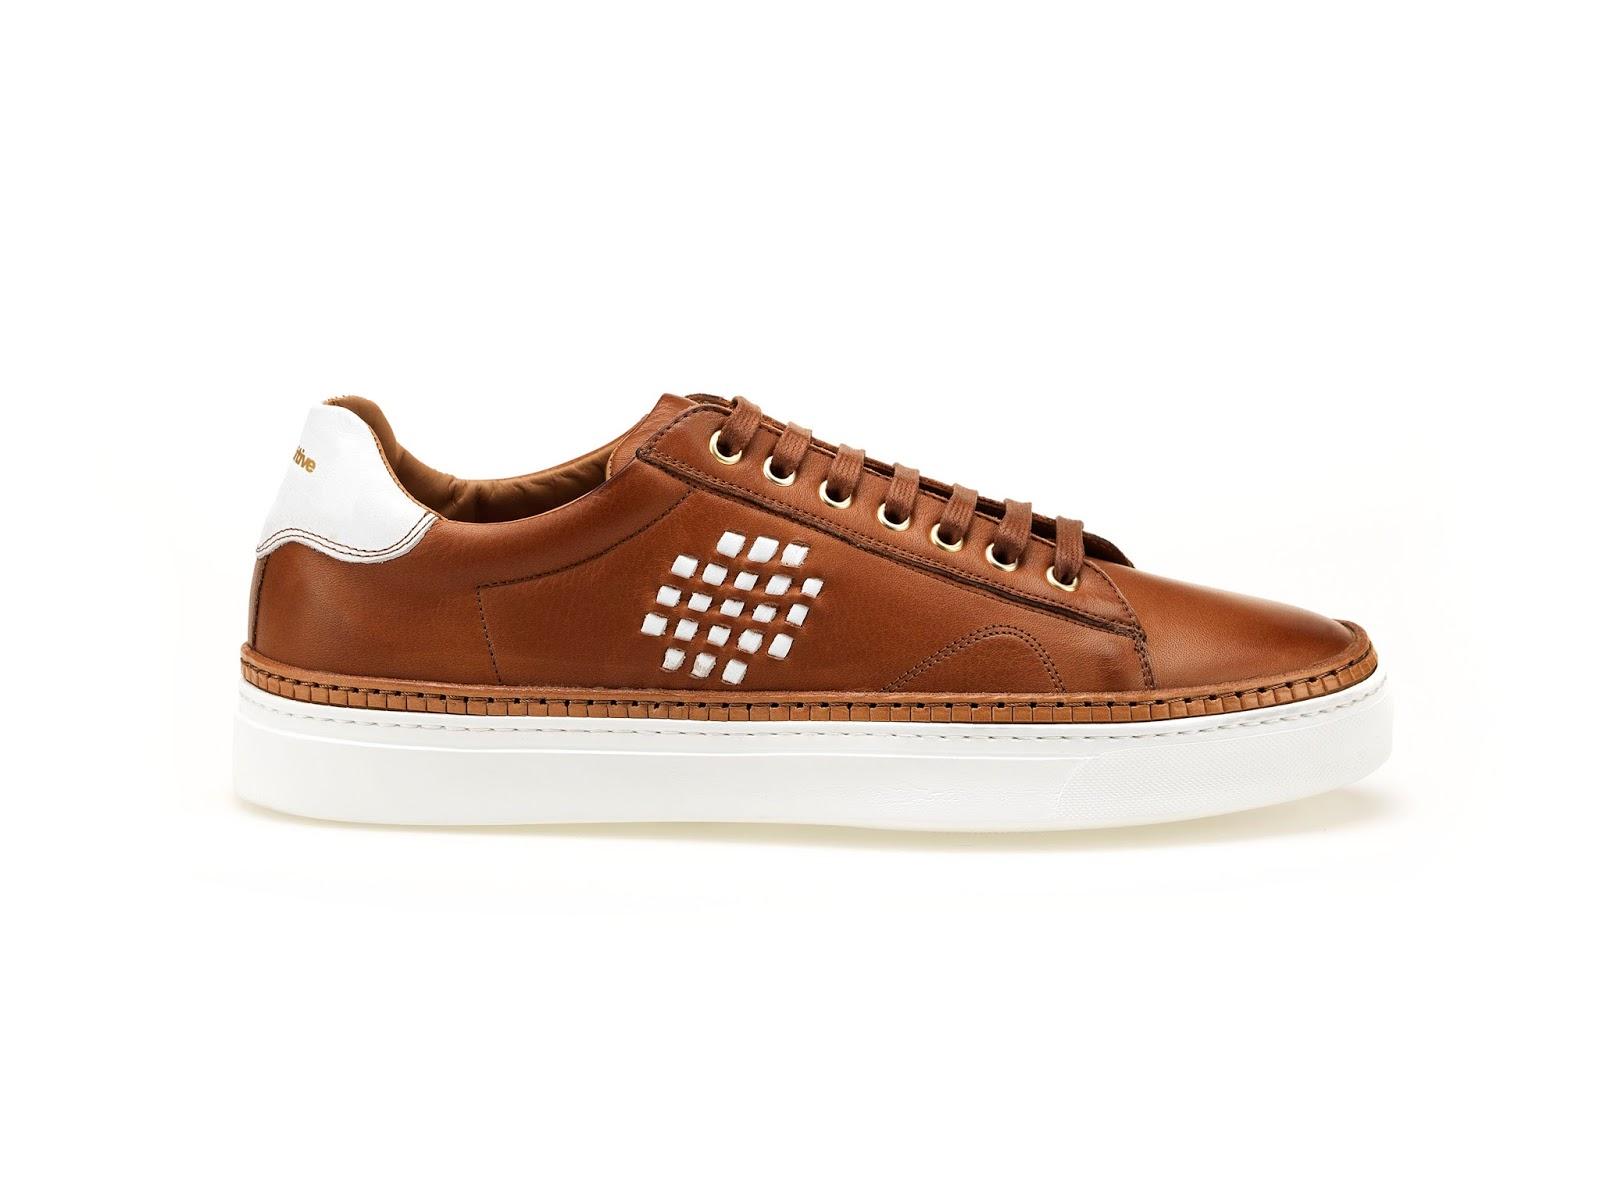 Eniwhere Fashion - BePositive sneakers - Pitti Uomo 93